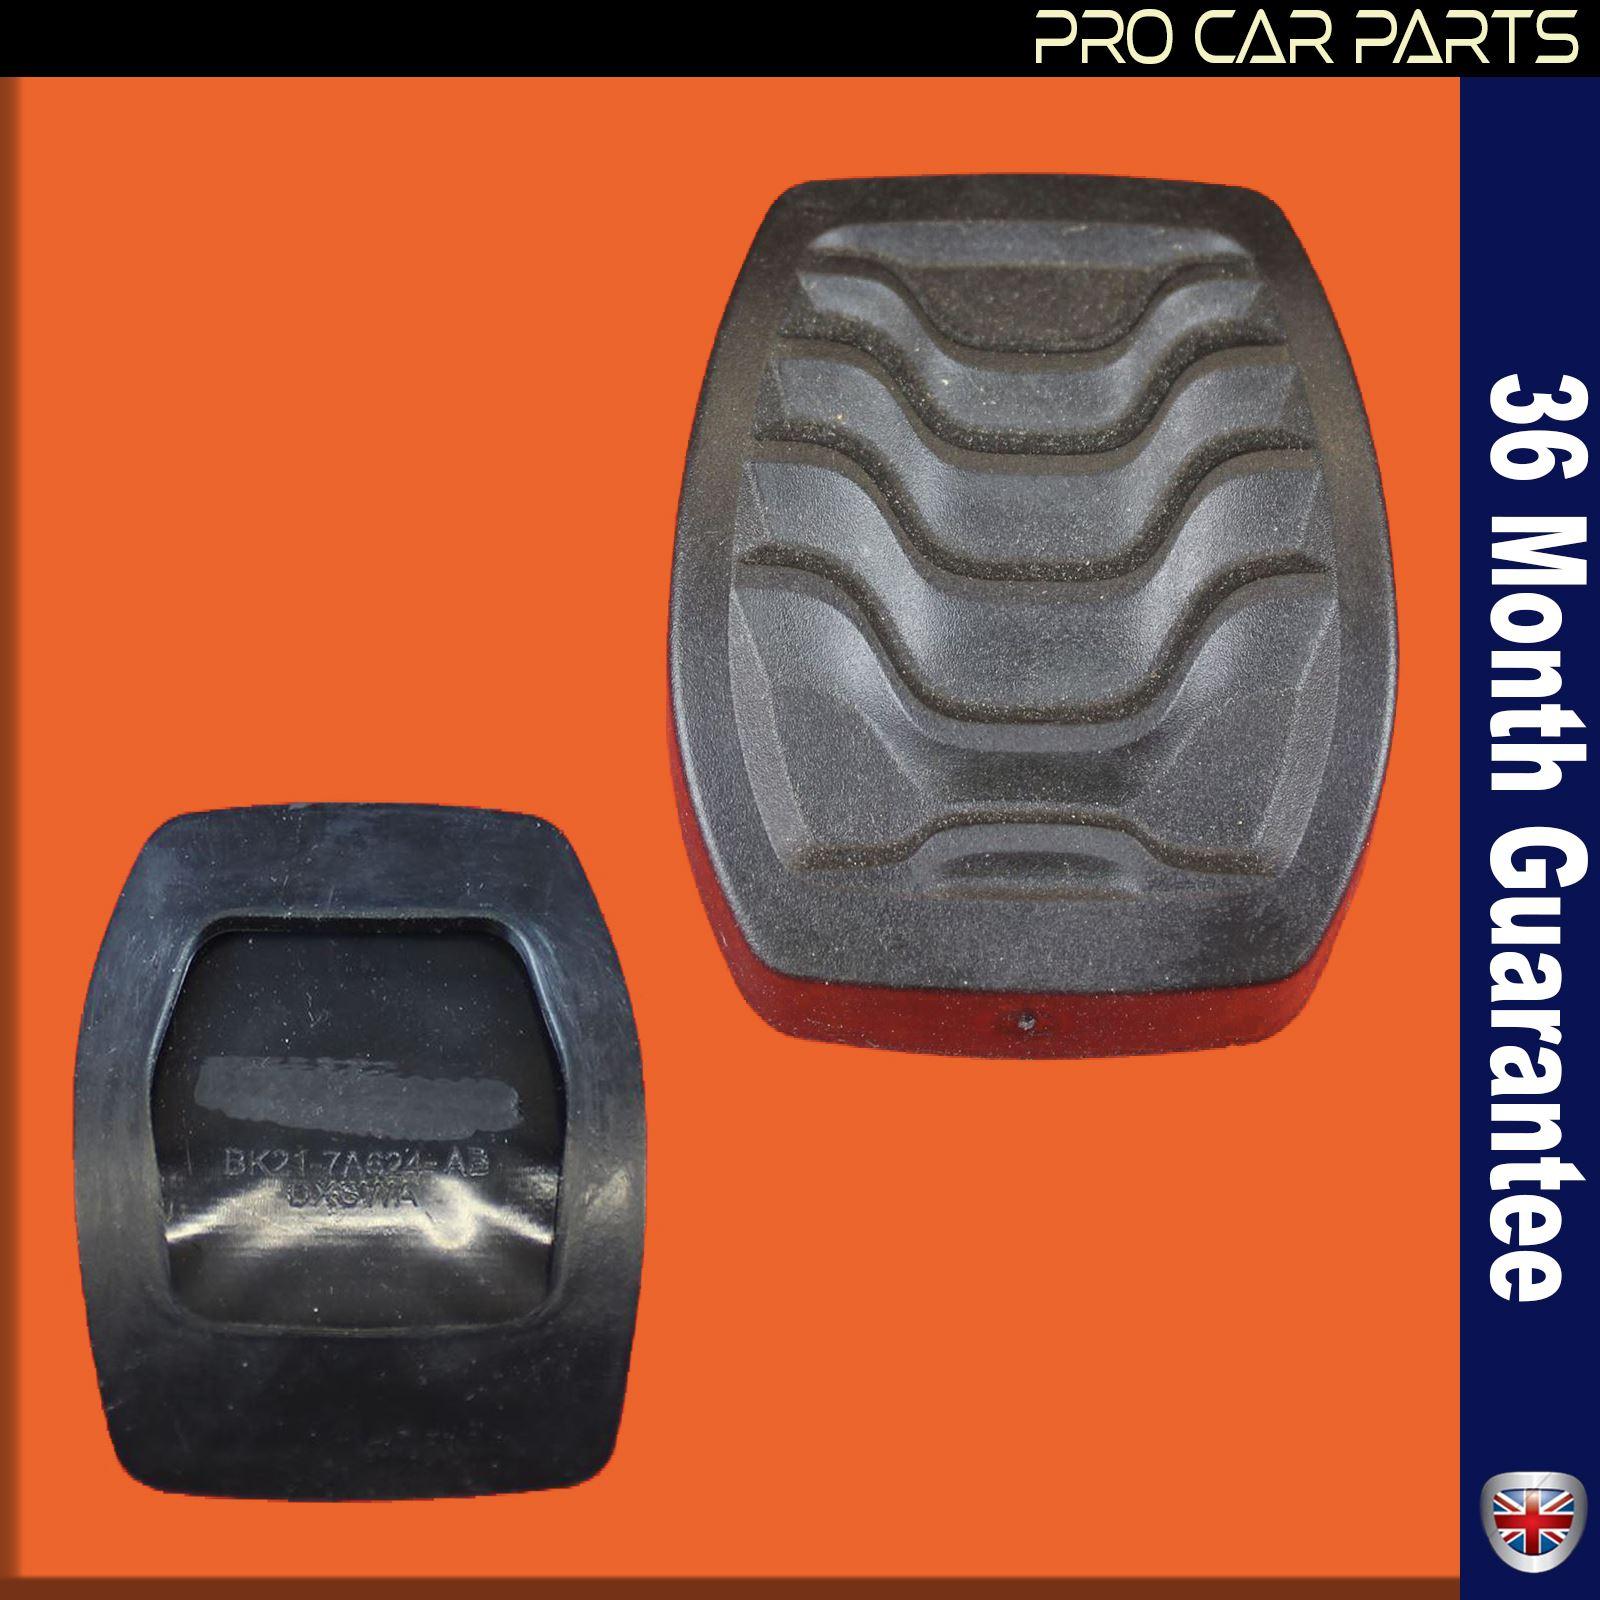 FORD TRANSIT Pedal Rubber Pedal Pad Clutch pedal Brake pedal brake pedal